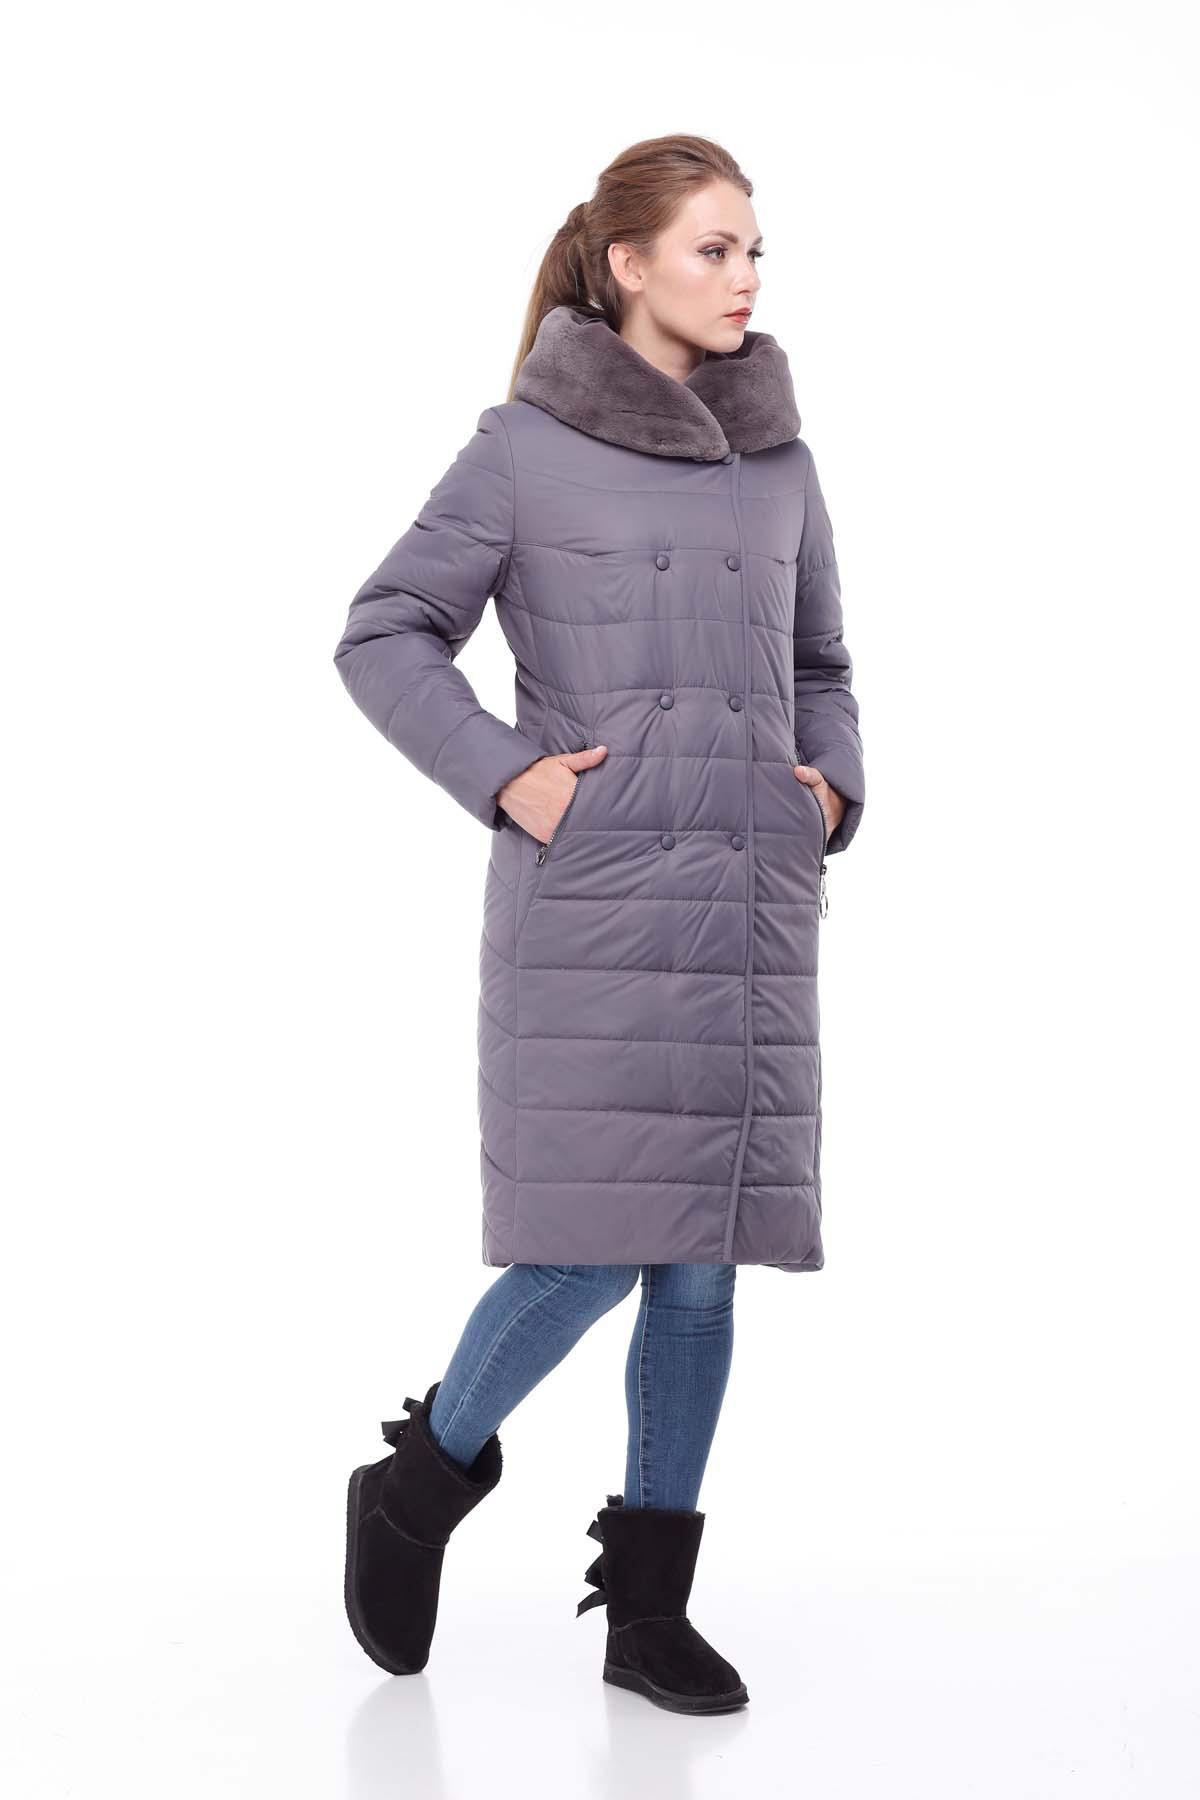 Зимове пальто стьогане Кім Зима, кролик антрацит